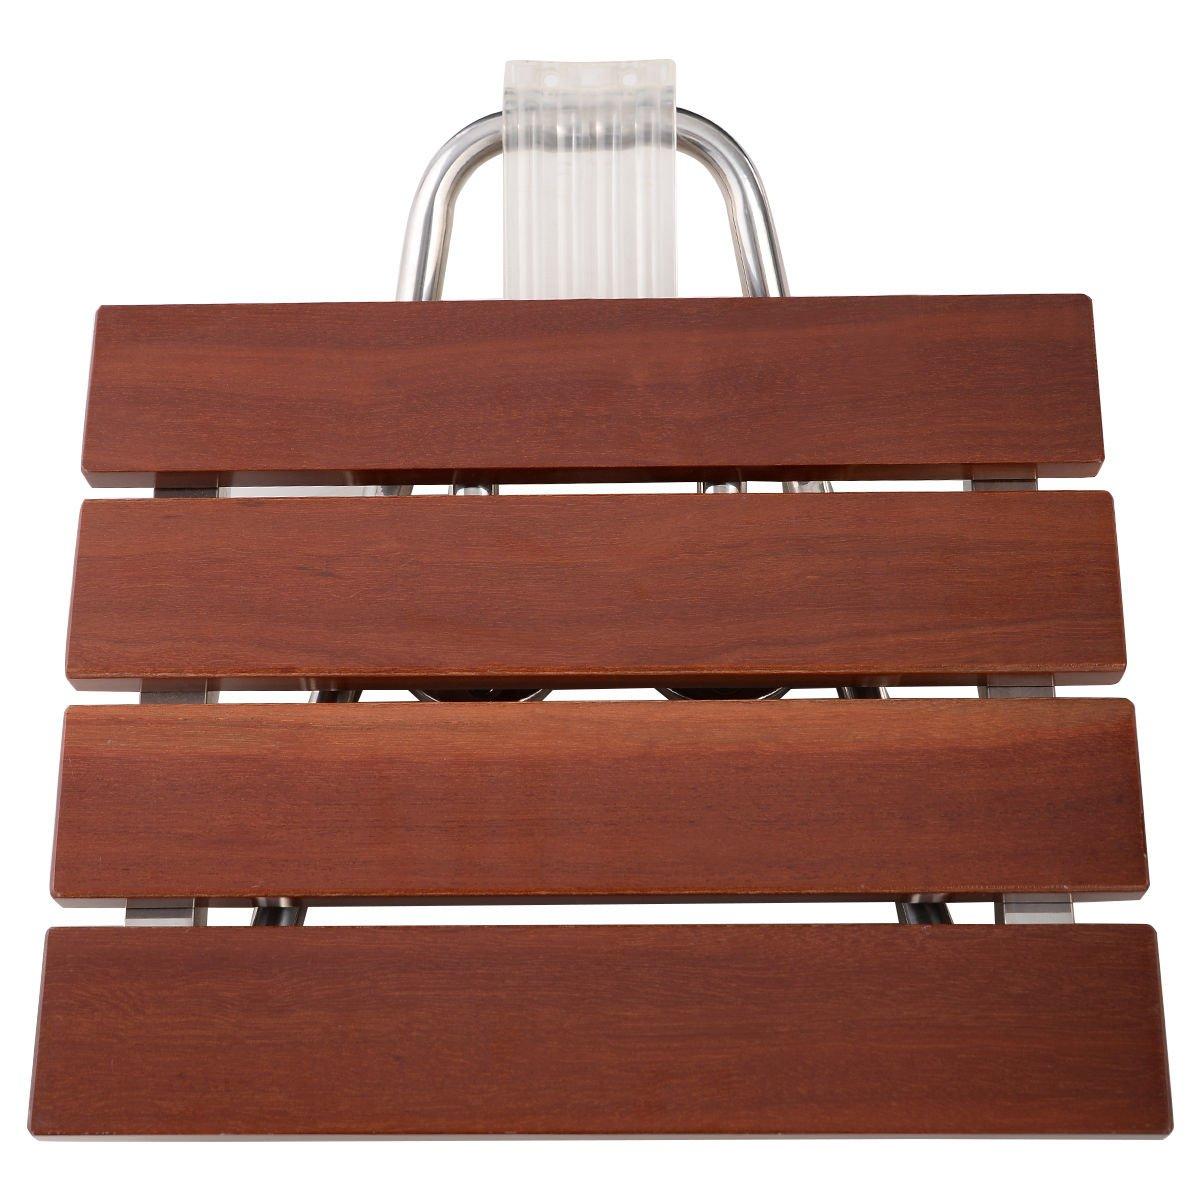 Giantex Folding Bath Seat Bench Shower Chair Wall Mount Solid Wood Construction